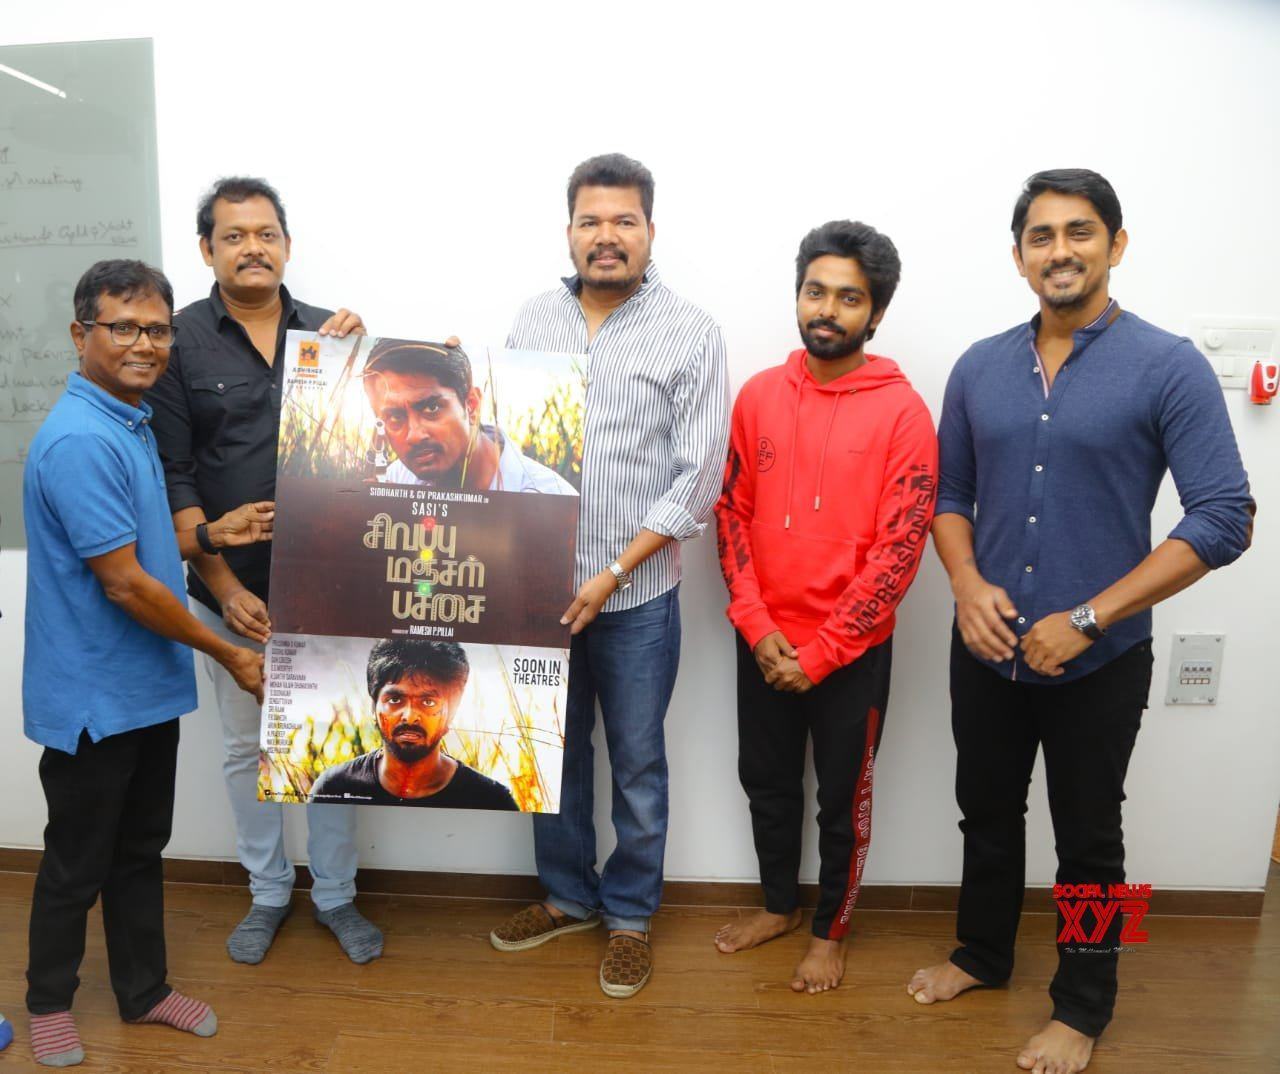 Sivappu Manjal Pachai Movie First Look Launched By Director Shankar Shanmugh